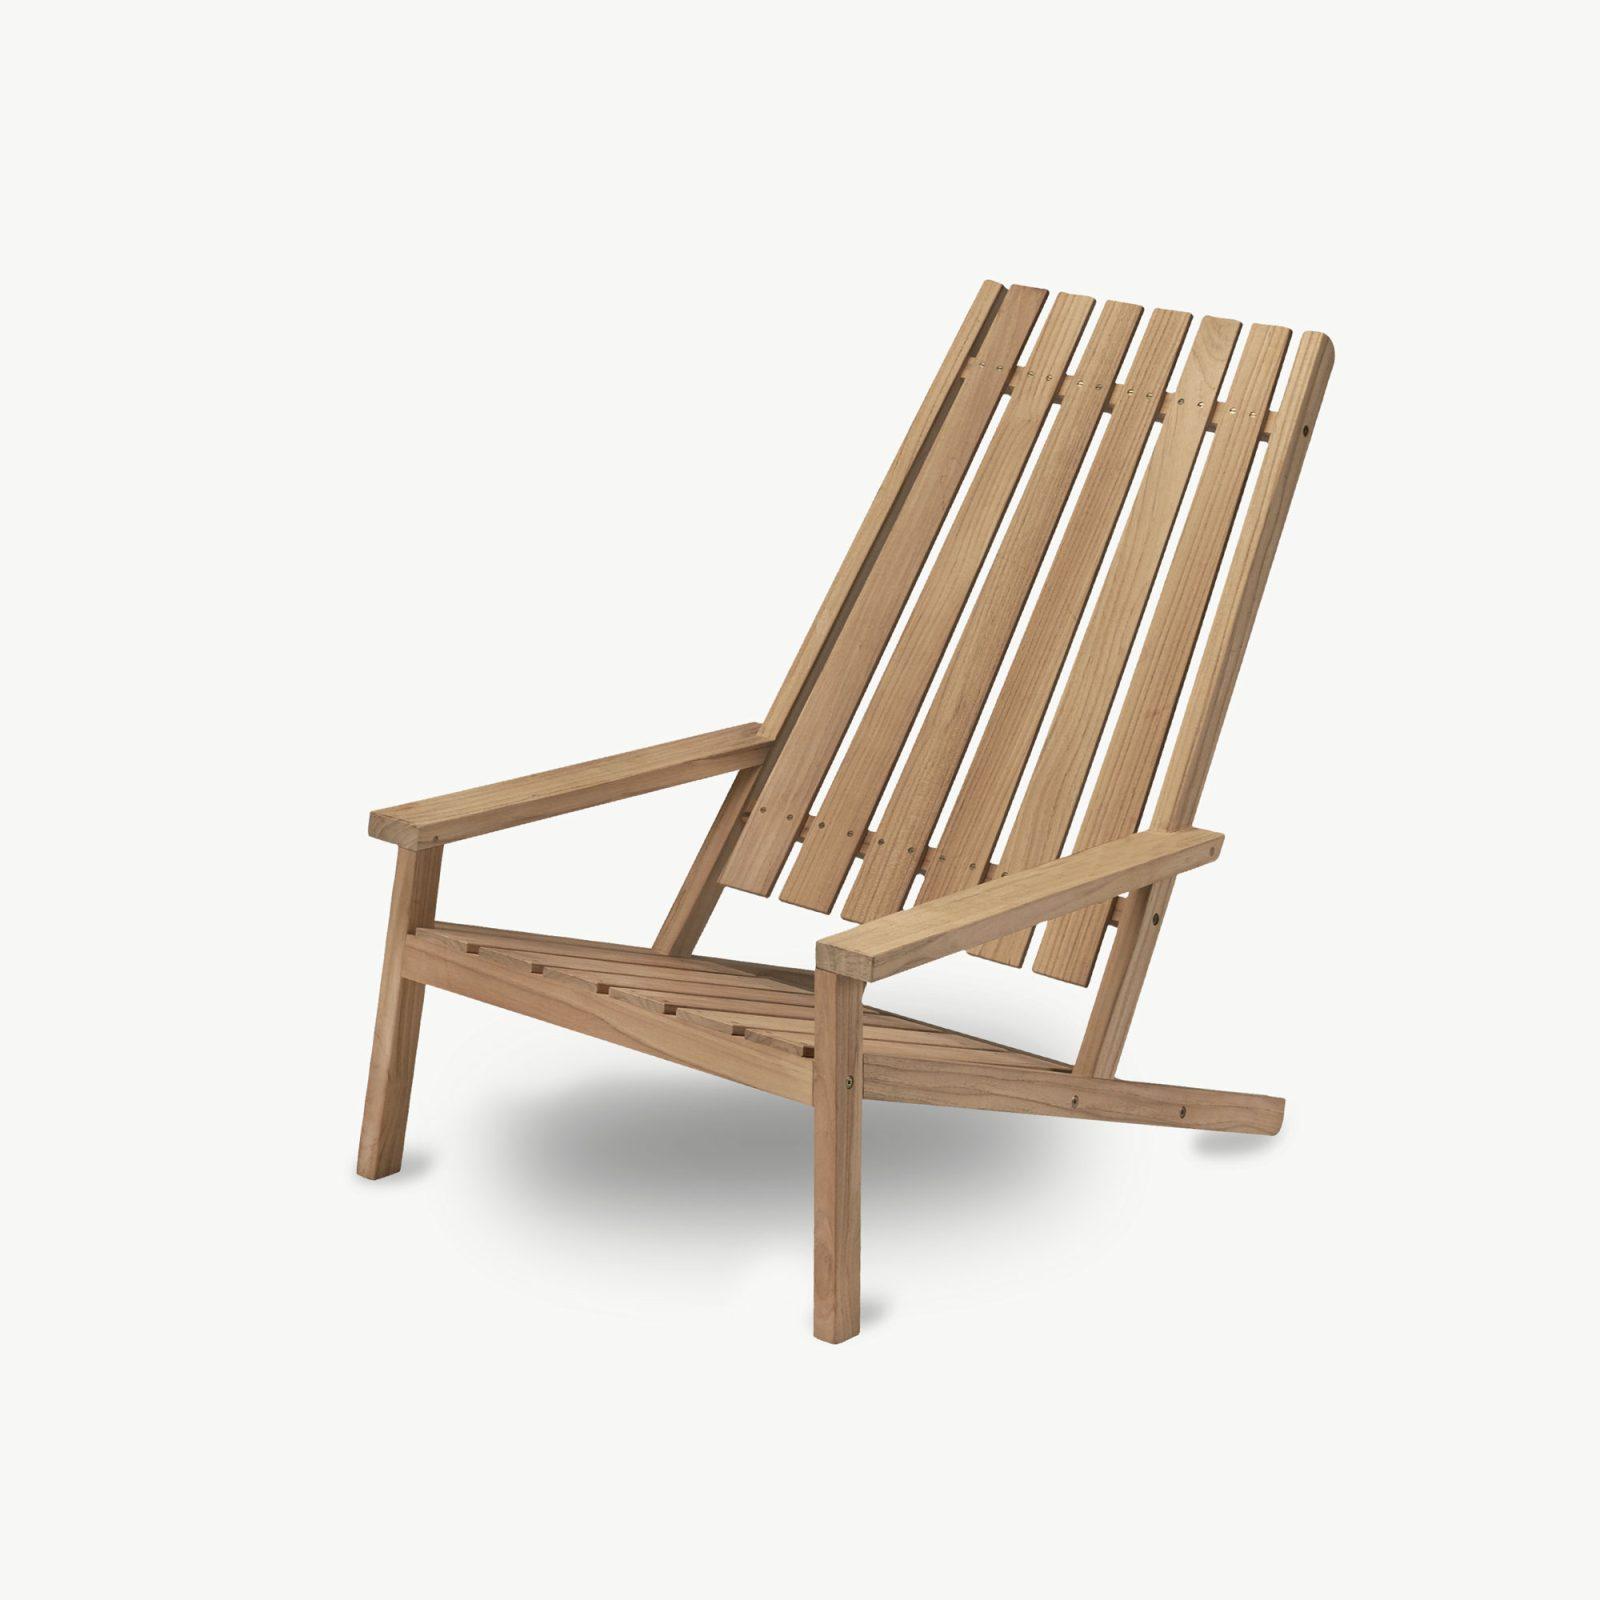 hardwood-garden-chairs-2